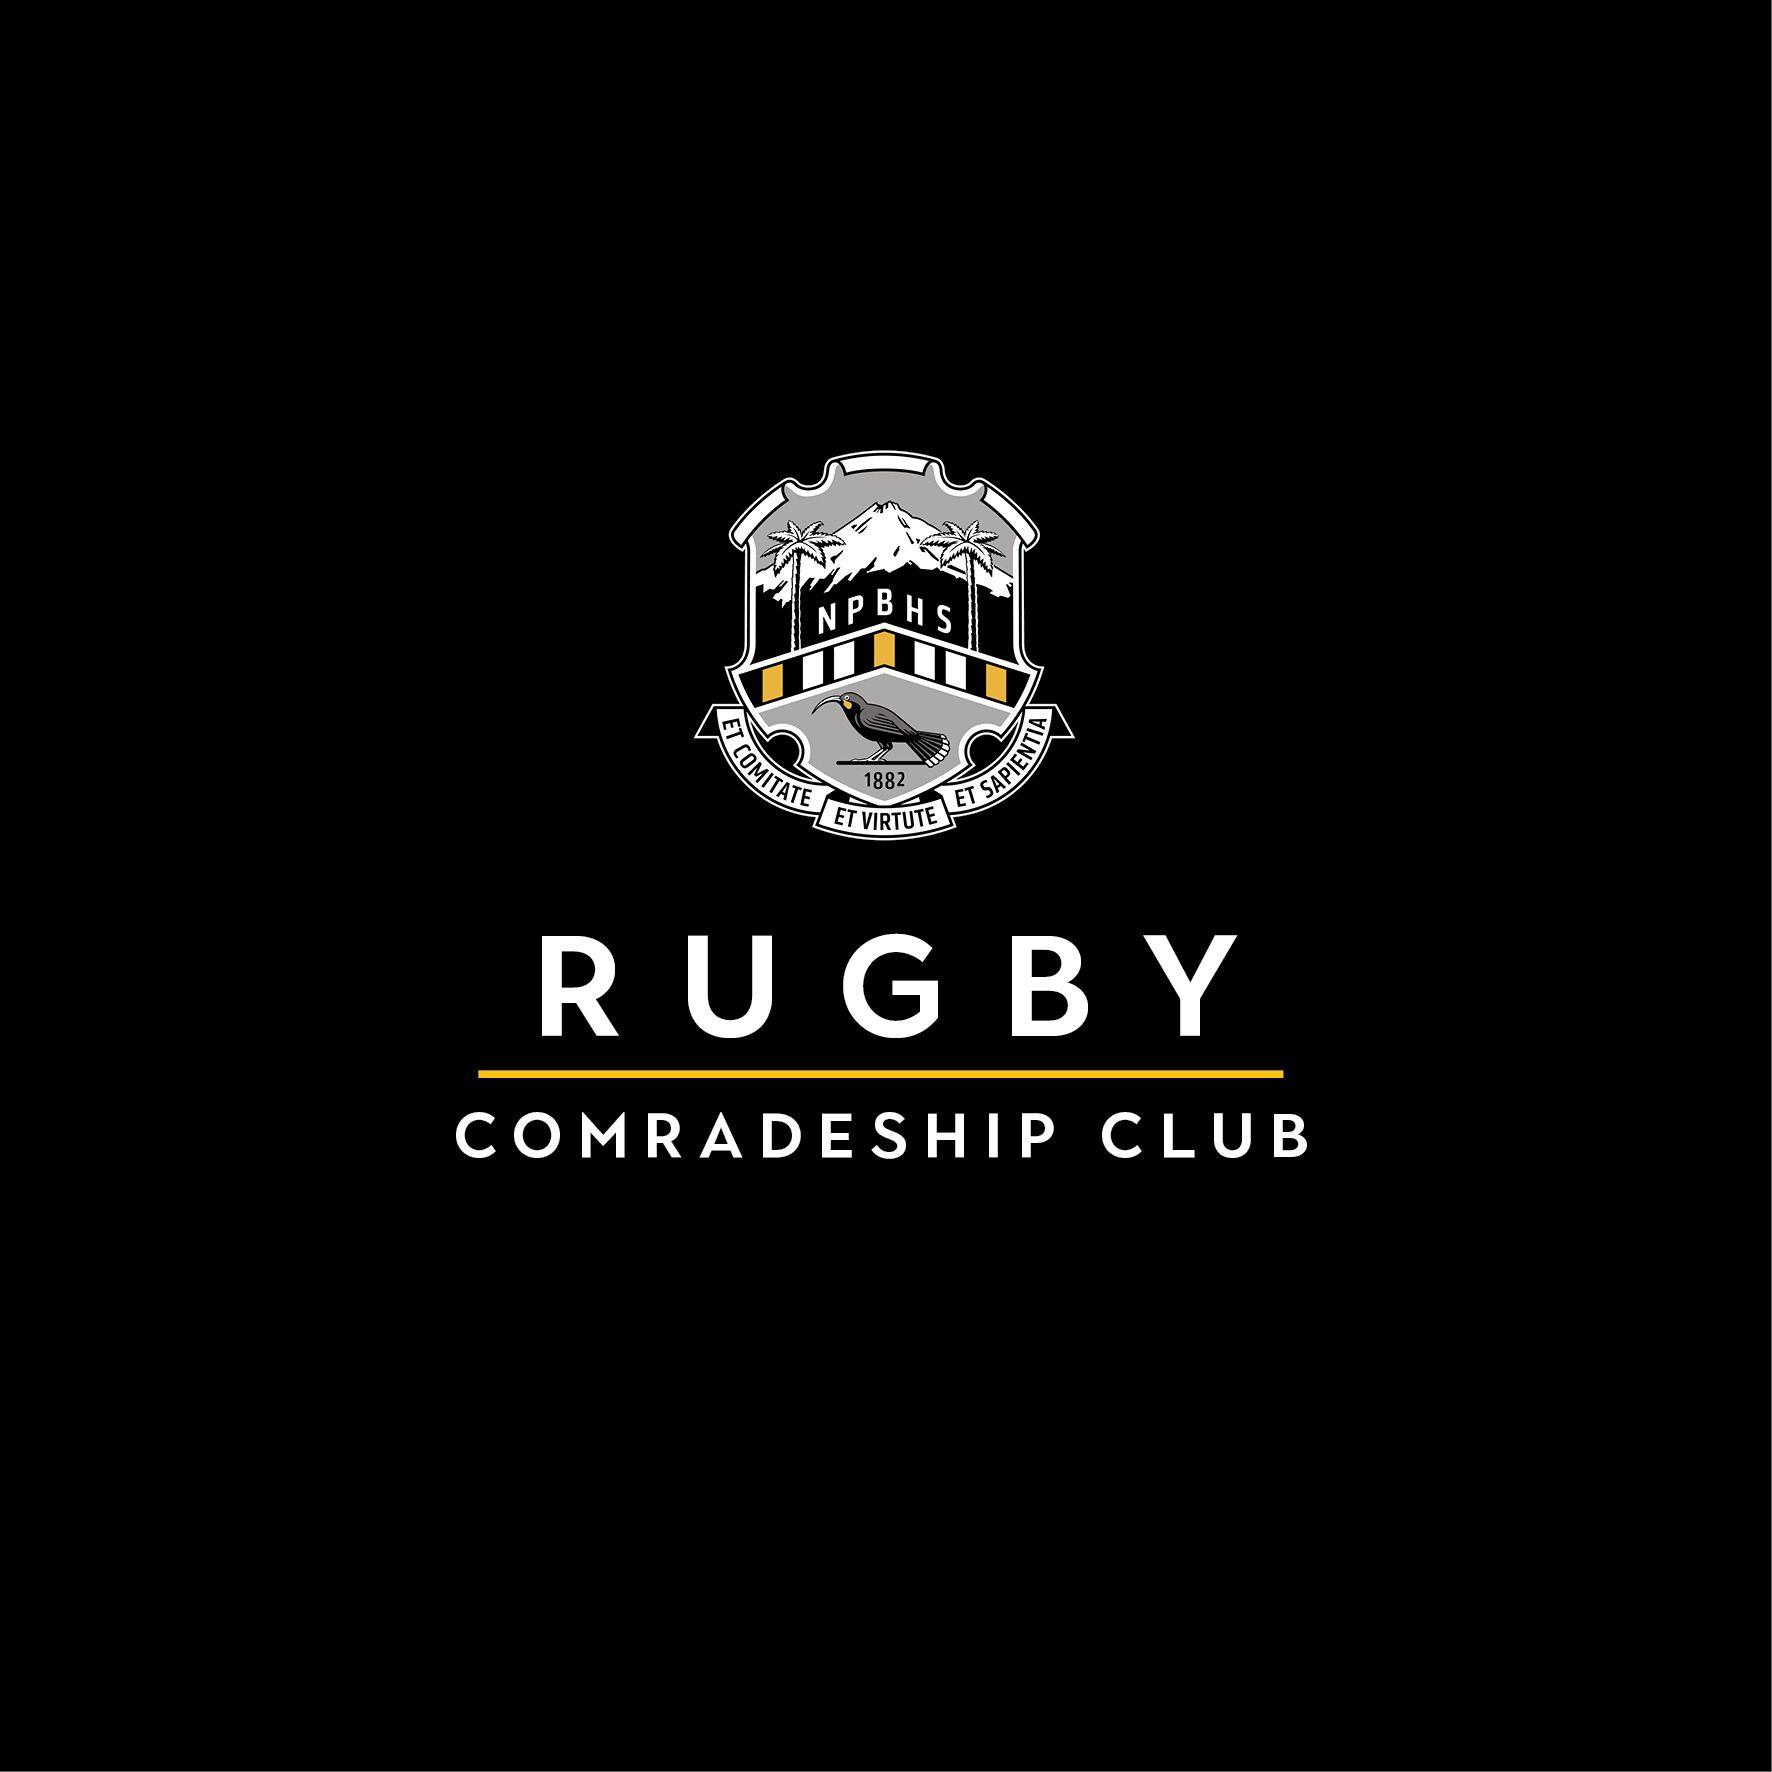 Rugby Comradeship Club